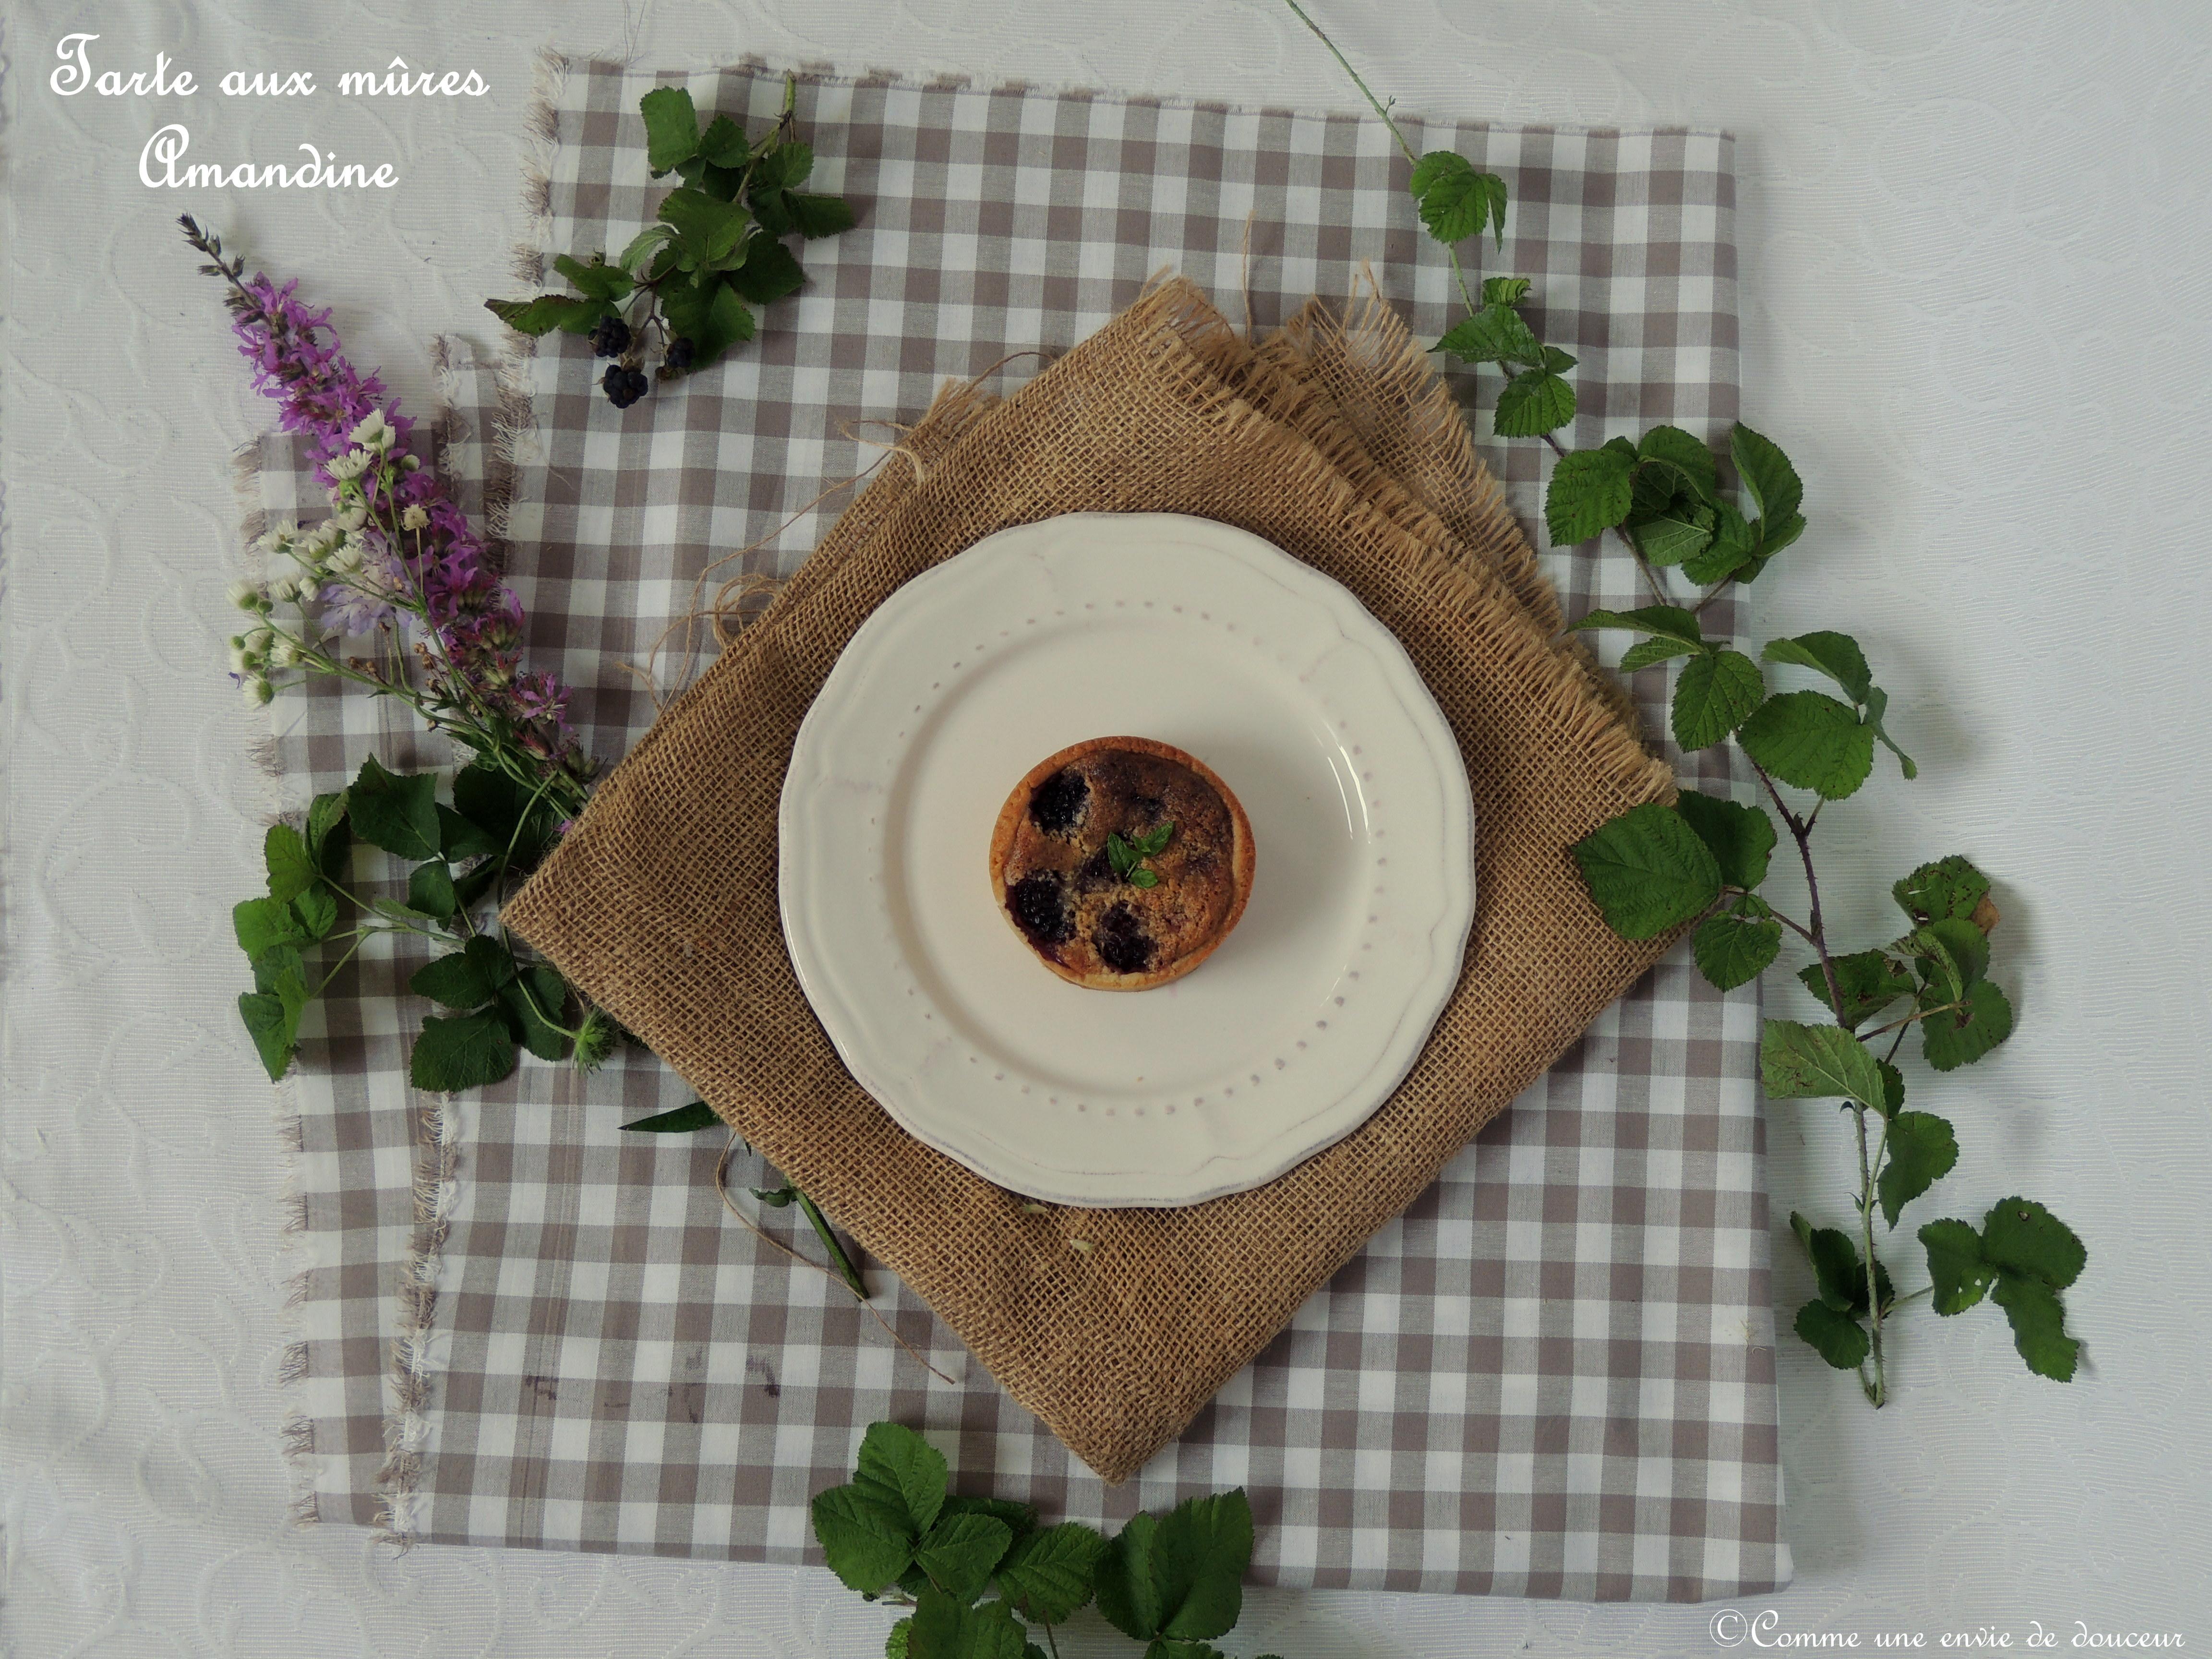 Tarte amandine aux mûres – Blackberry almond tartlets